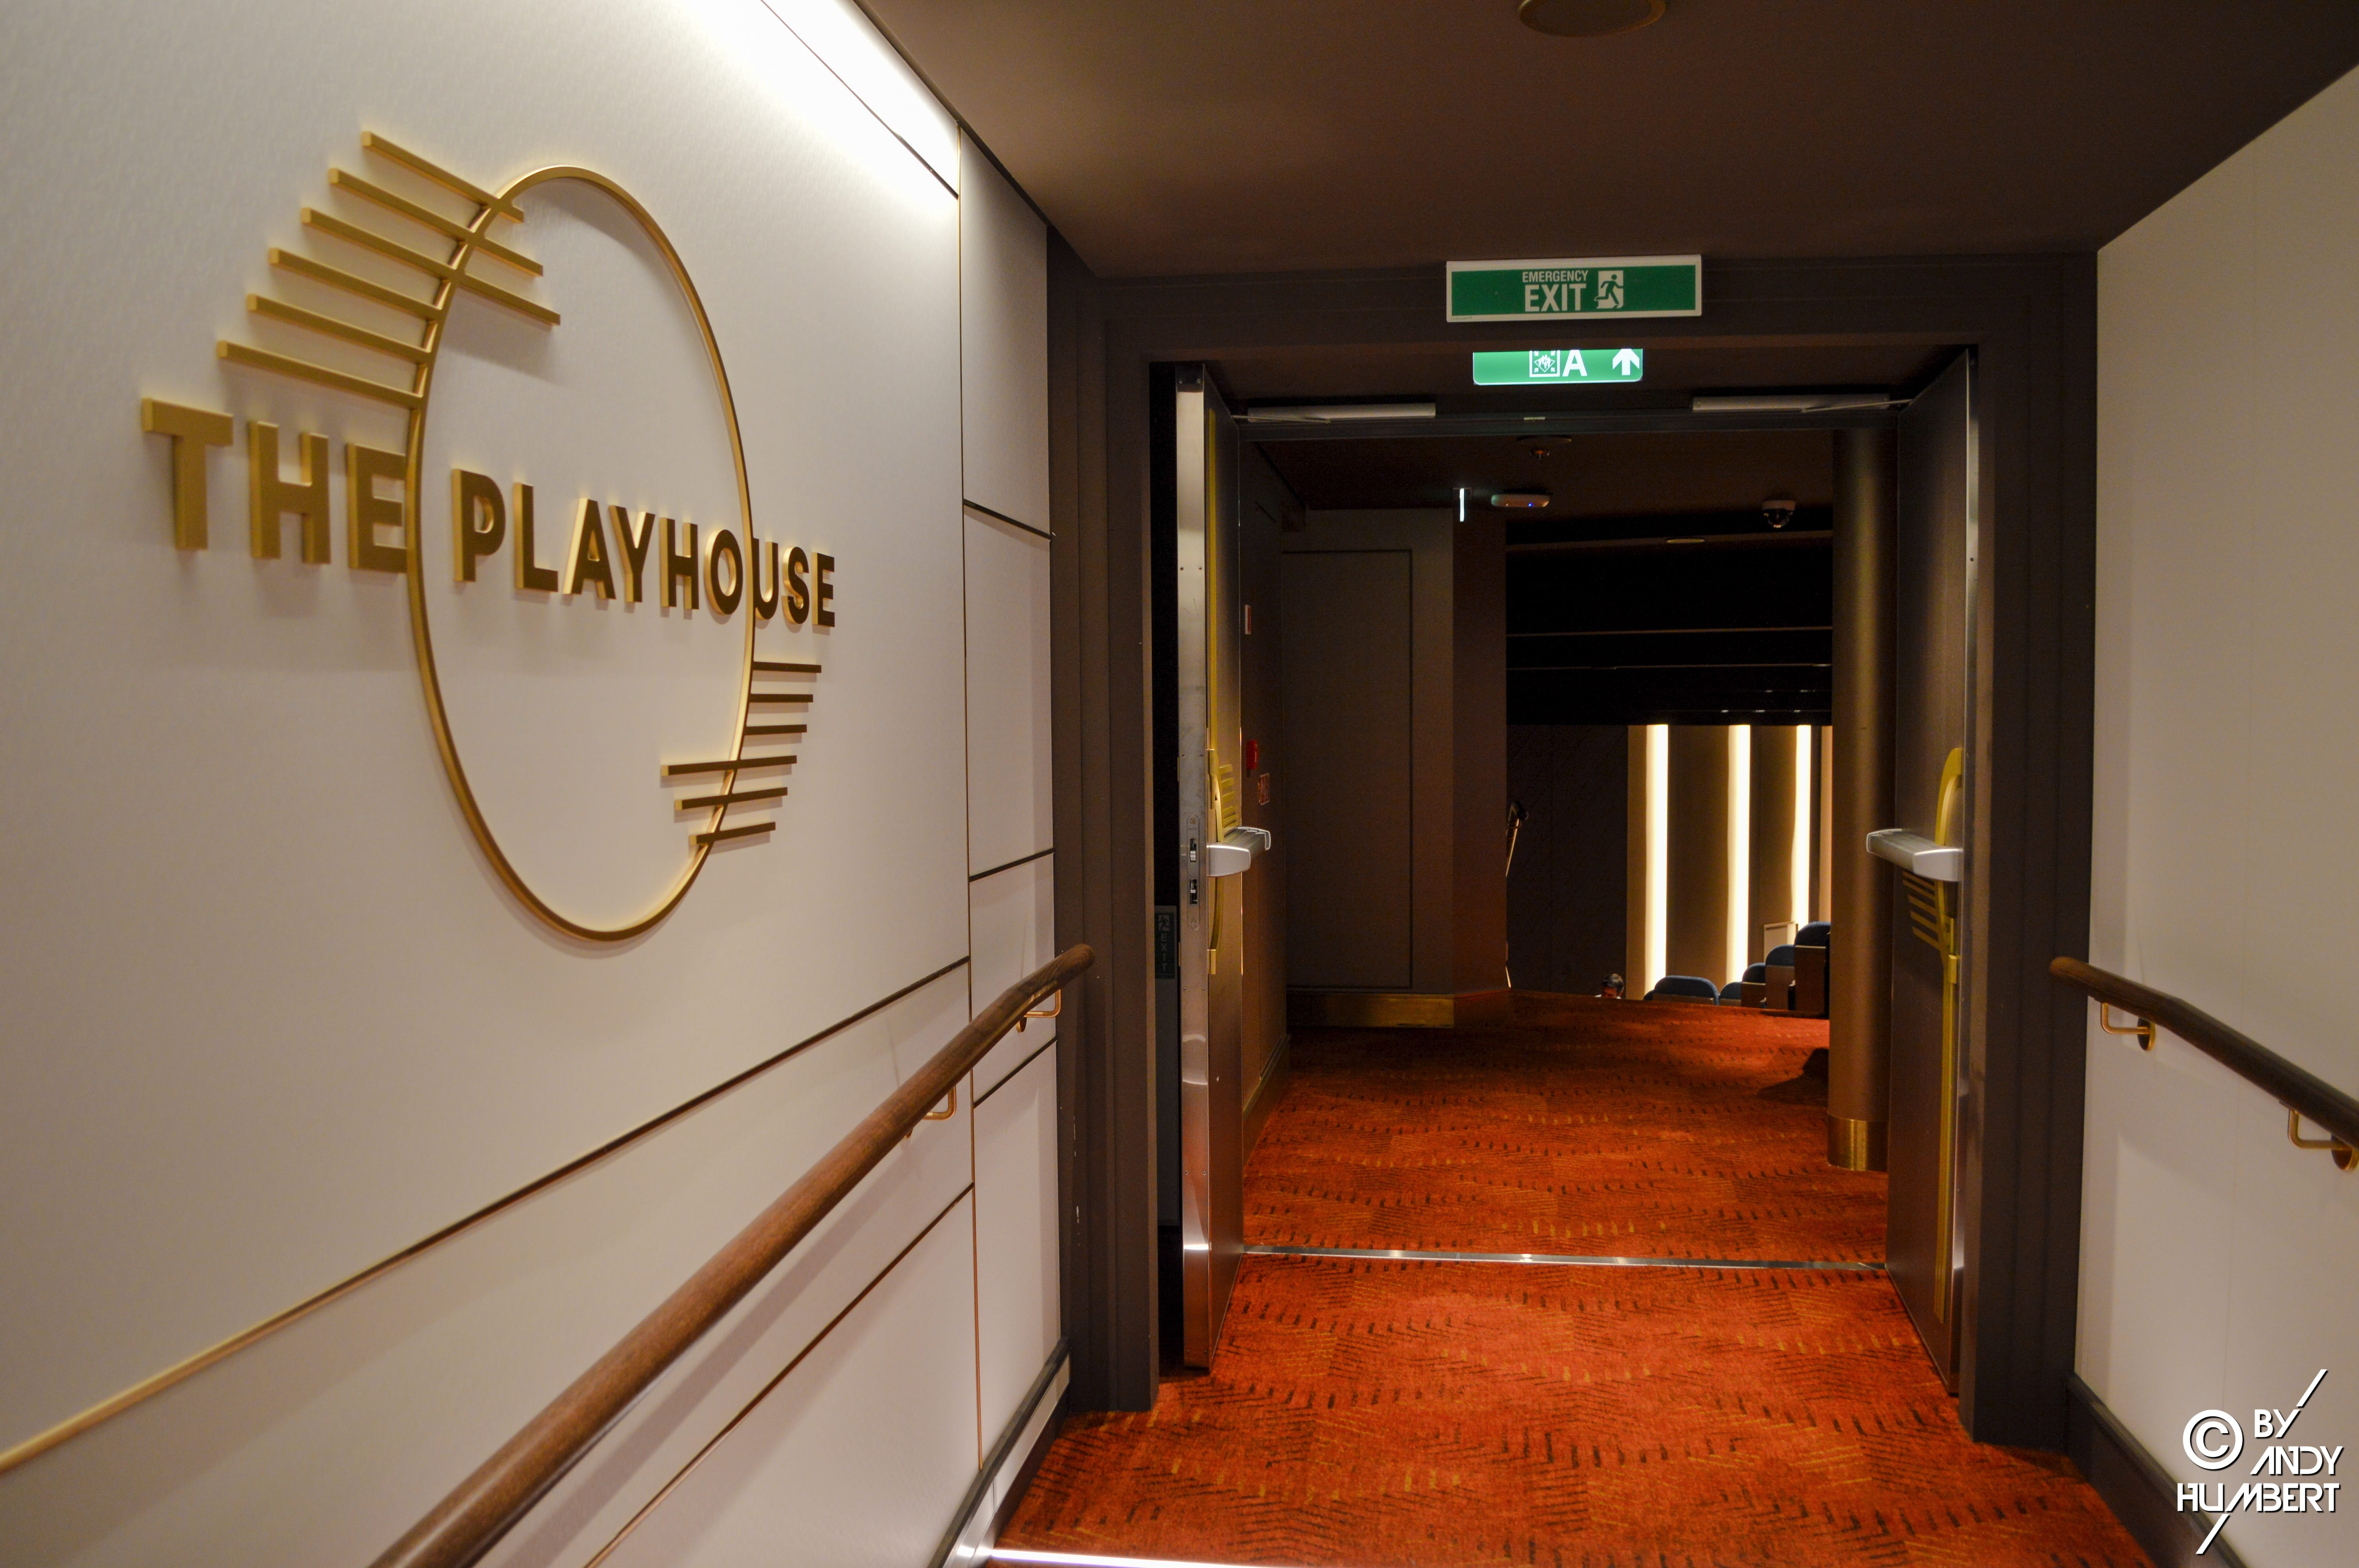 The Playhouse (Promenade deck)